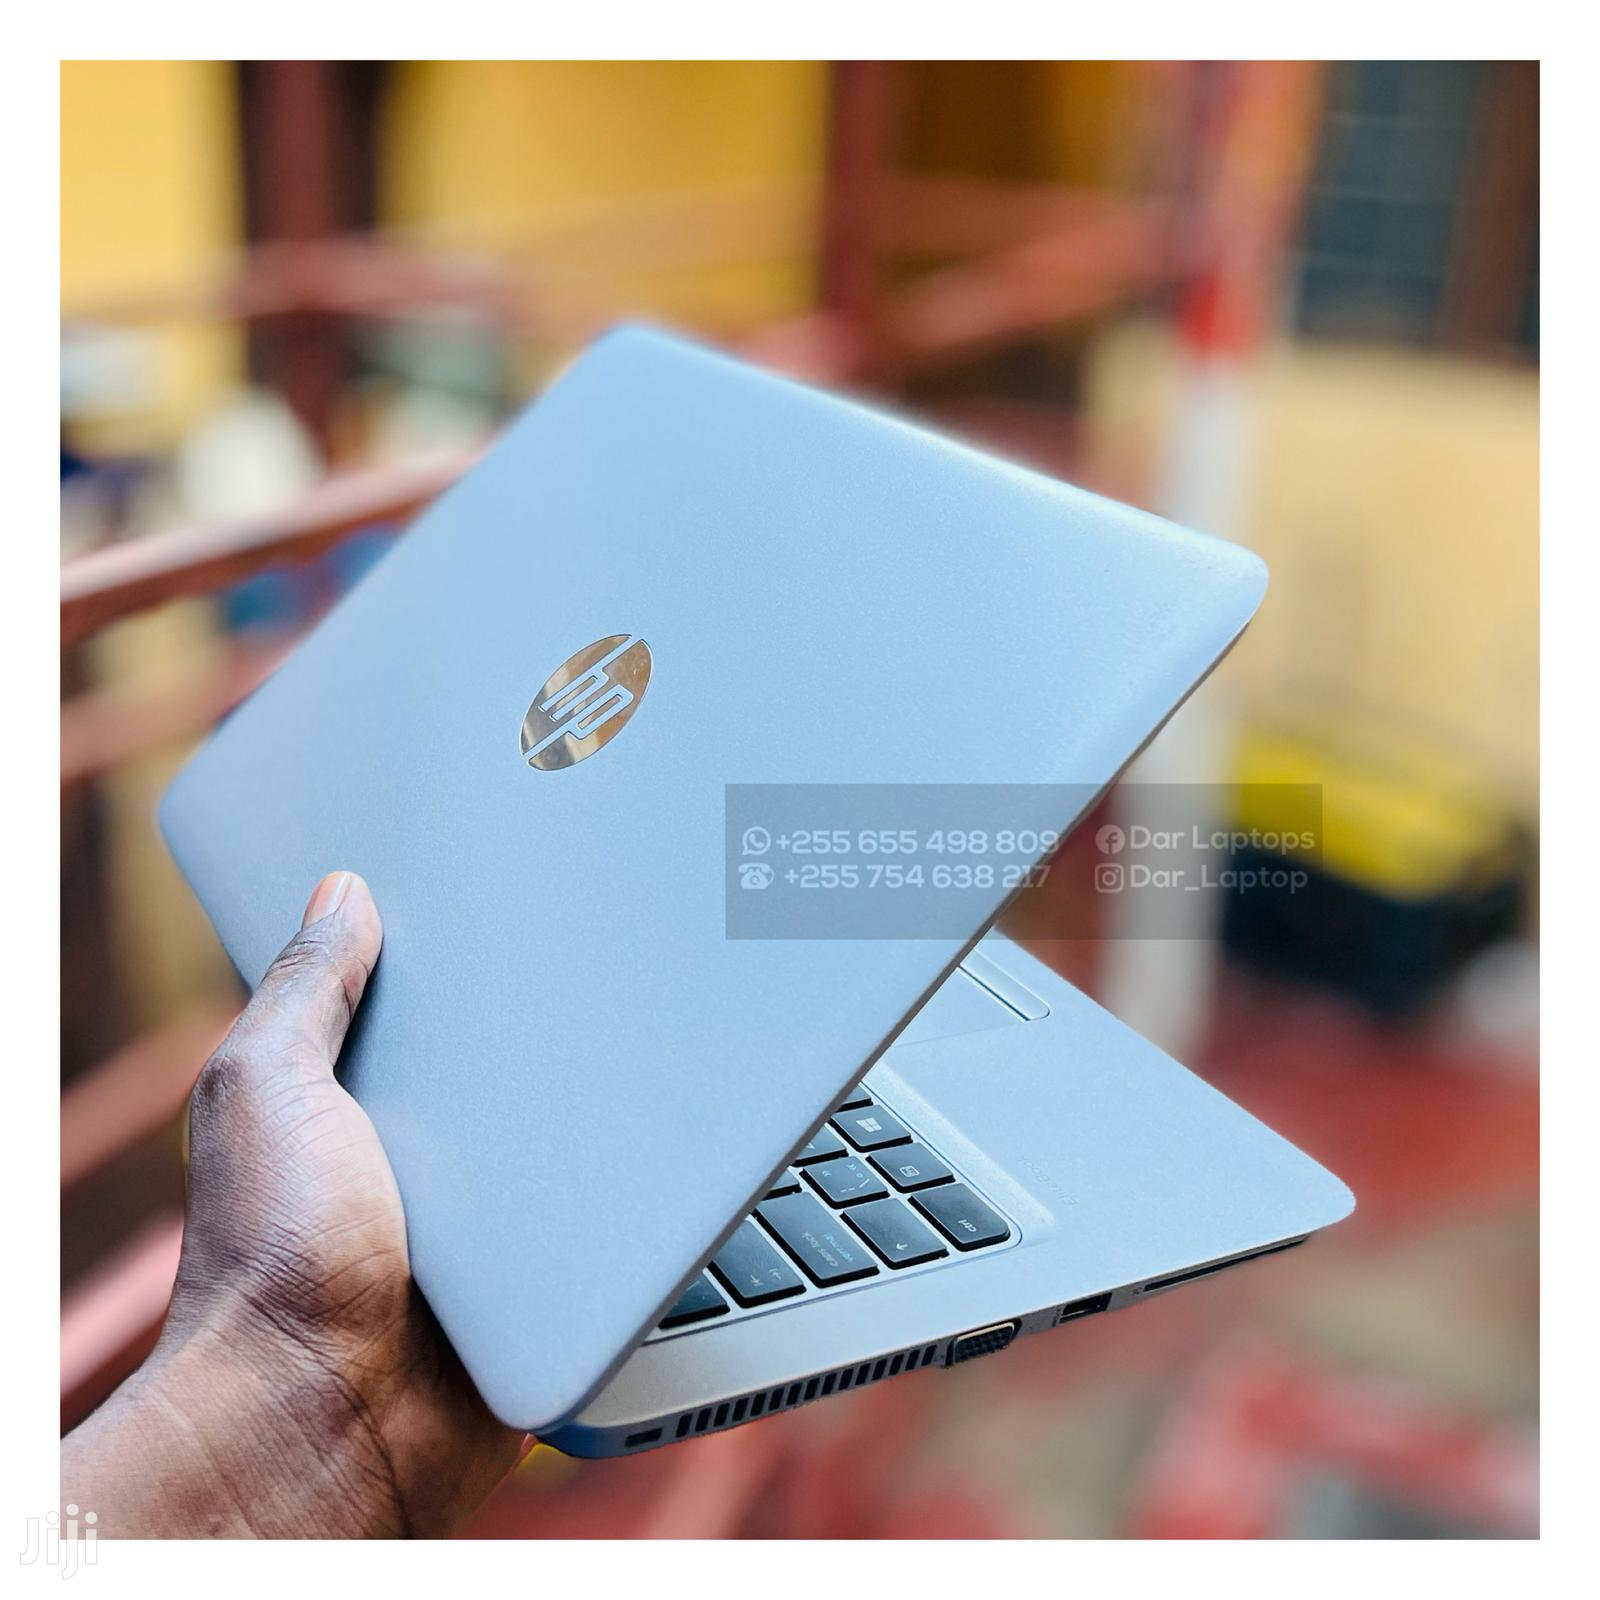 Archive: Laptop HP EliteBook 820 G3 16GB Intel Core I5 SSD 256GB